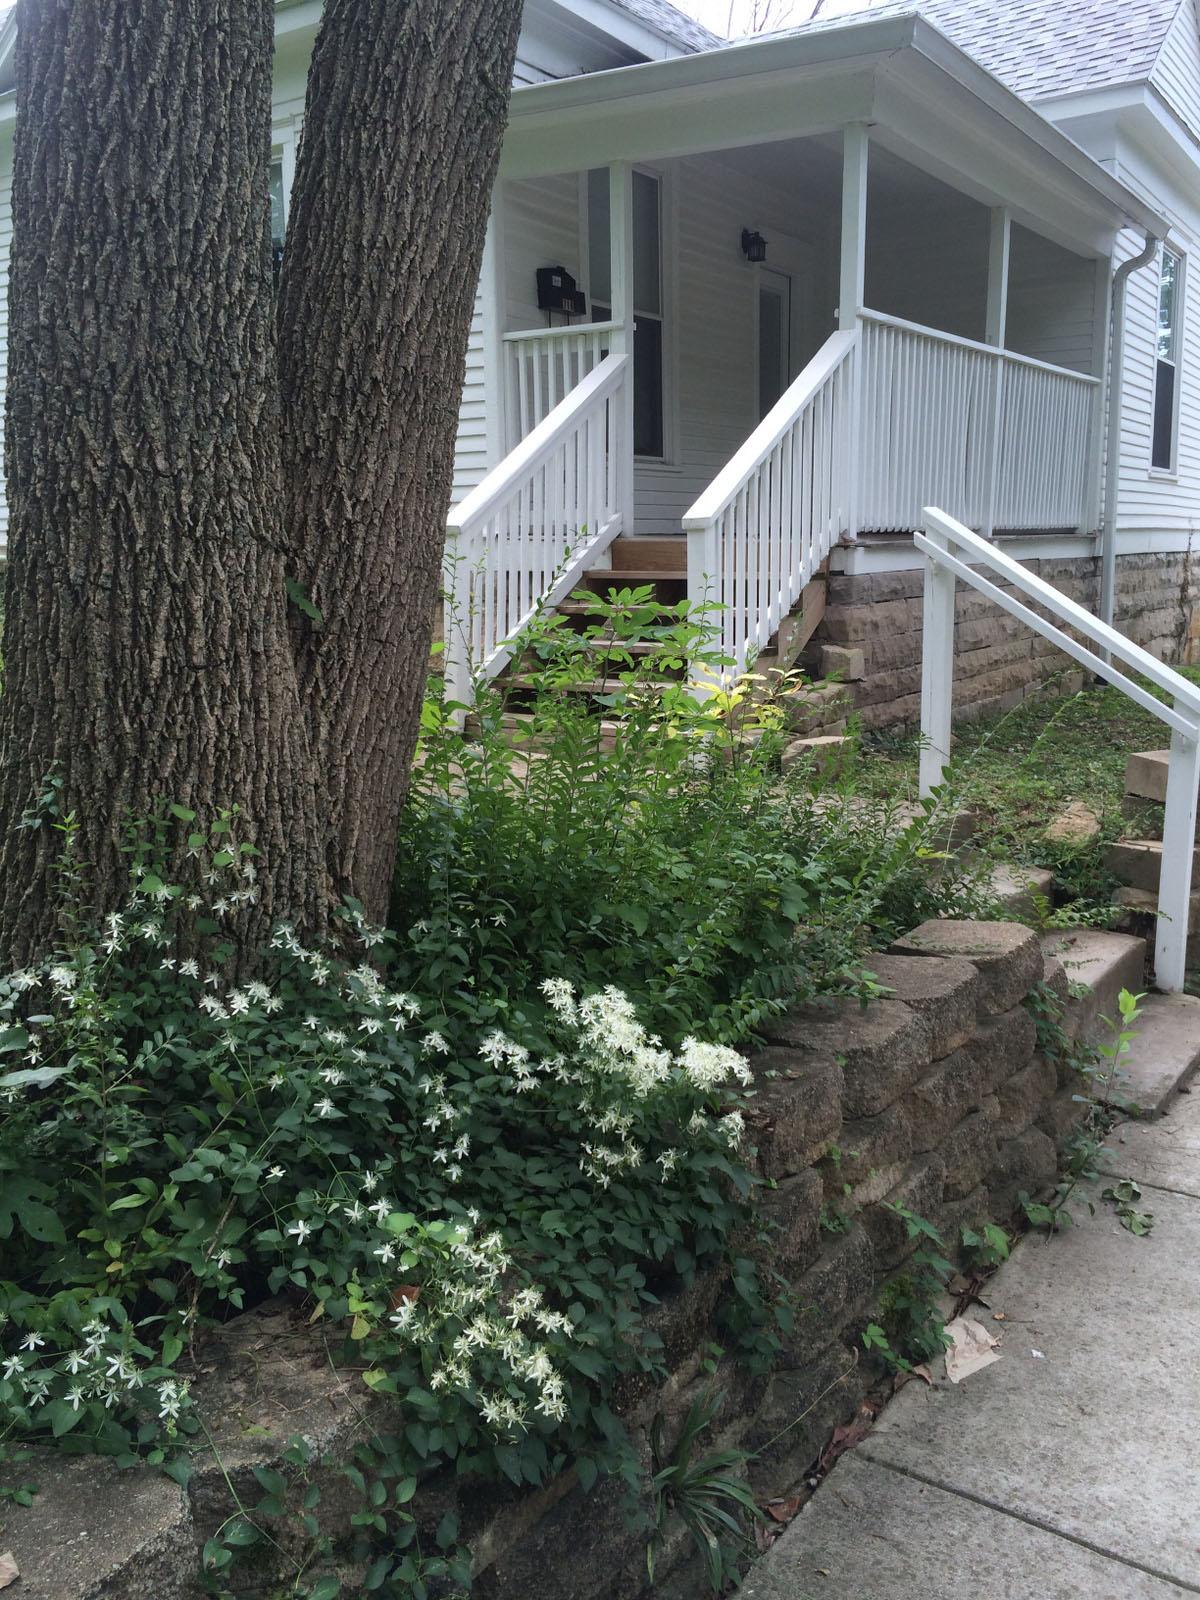 Visiting faculty at Indiana University  On sabbatical  New to Bloomington   We have sabbatical homes for rent in Bloomington IN. Sabbatical Rental Homes in Bloomington   Elkins Apartments